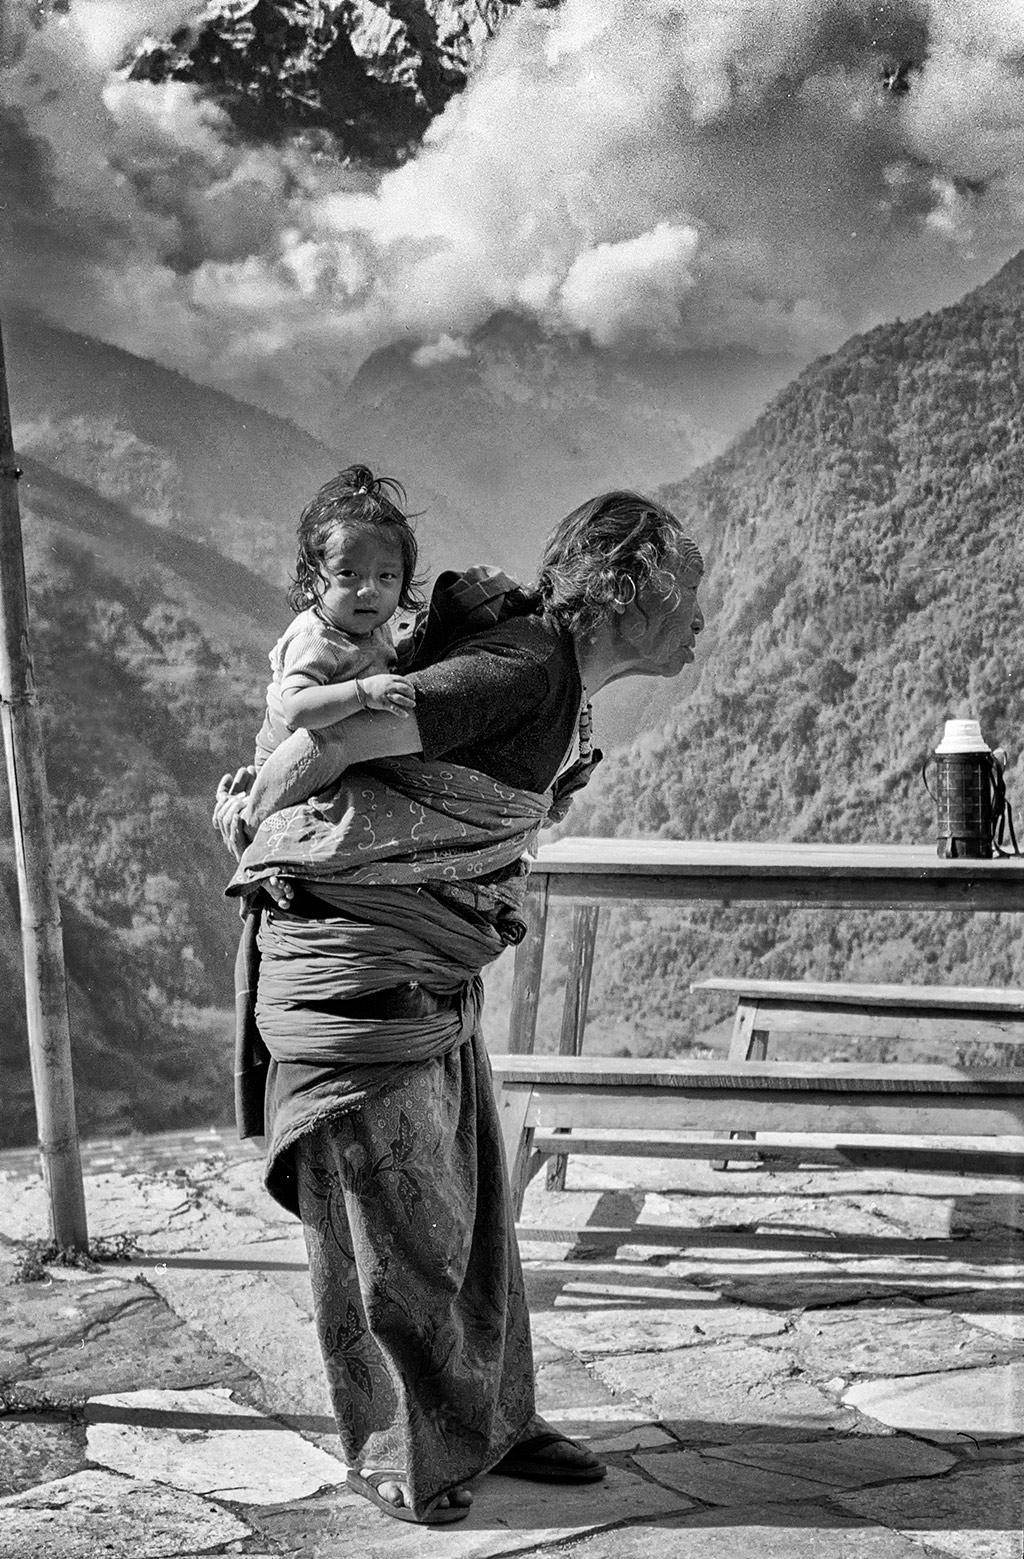 Old woman and child - near Annapurna, Nepal